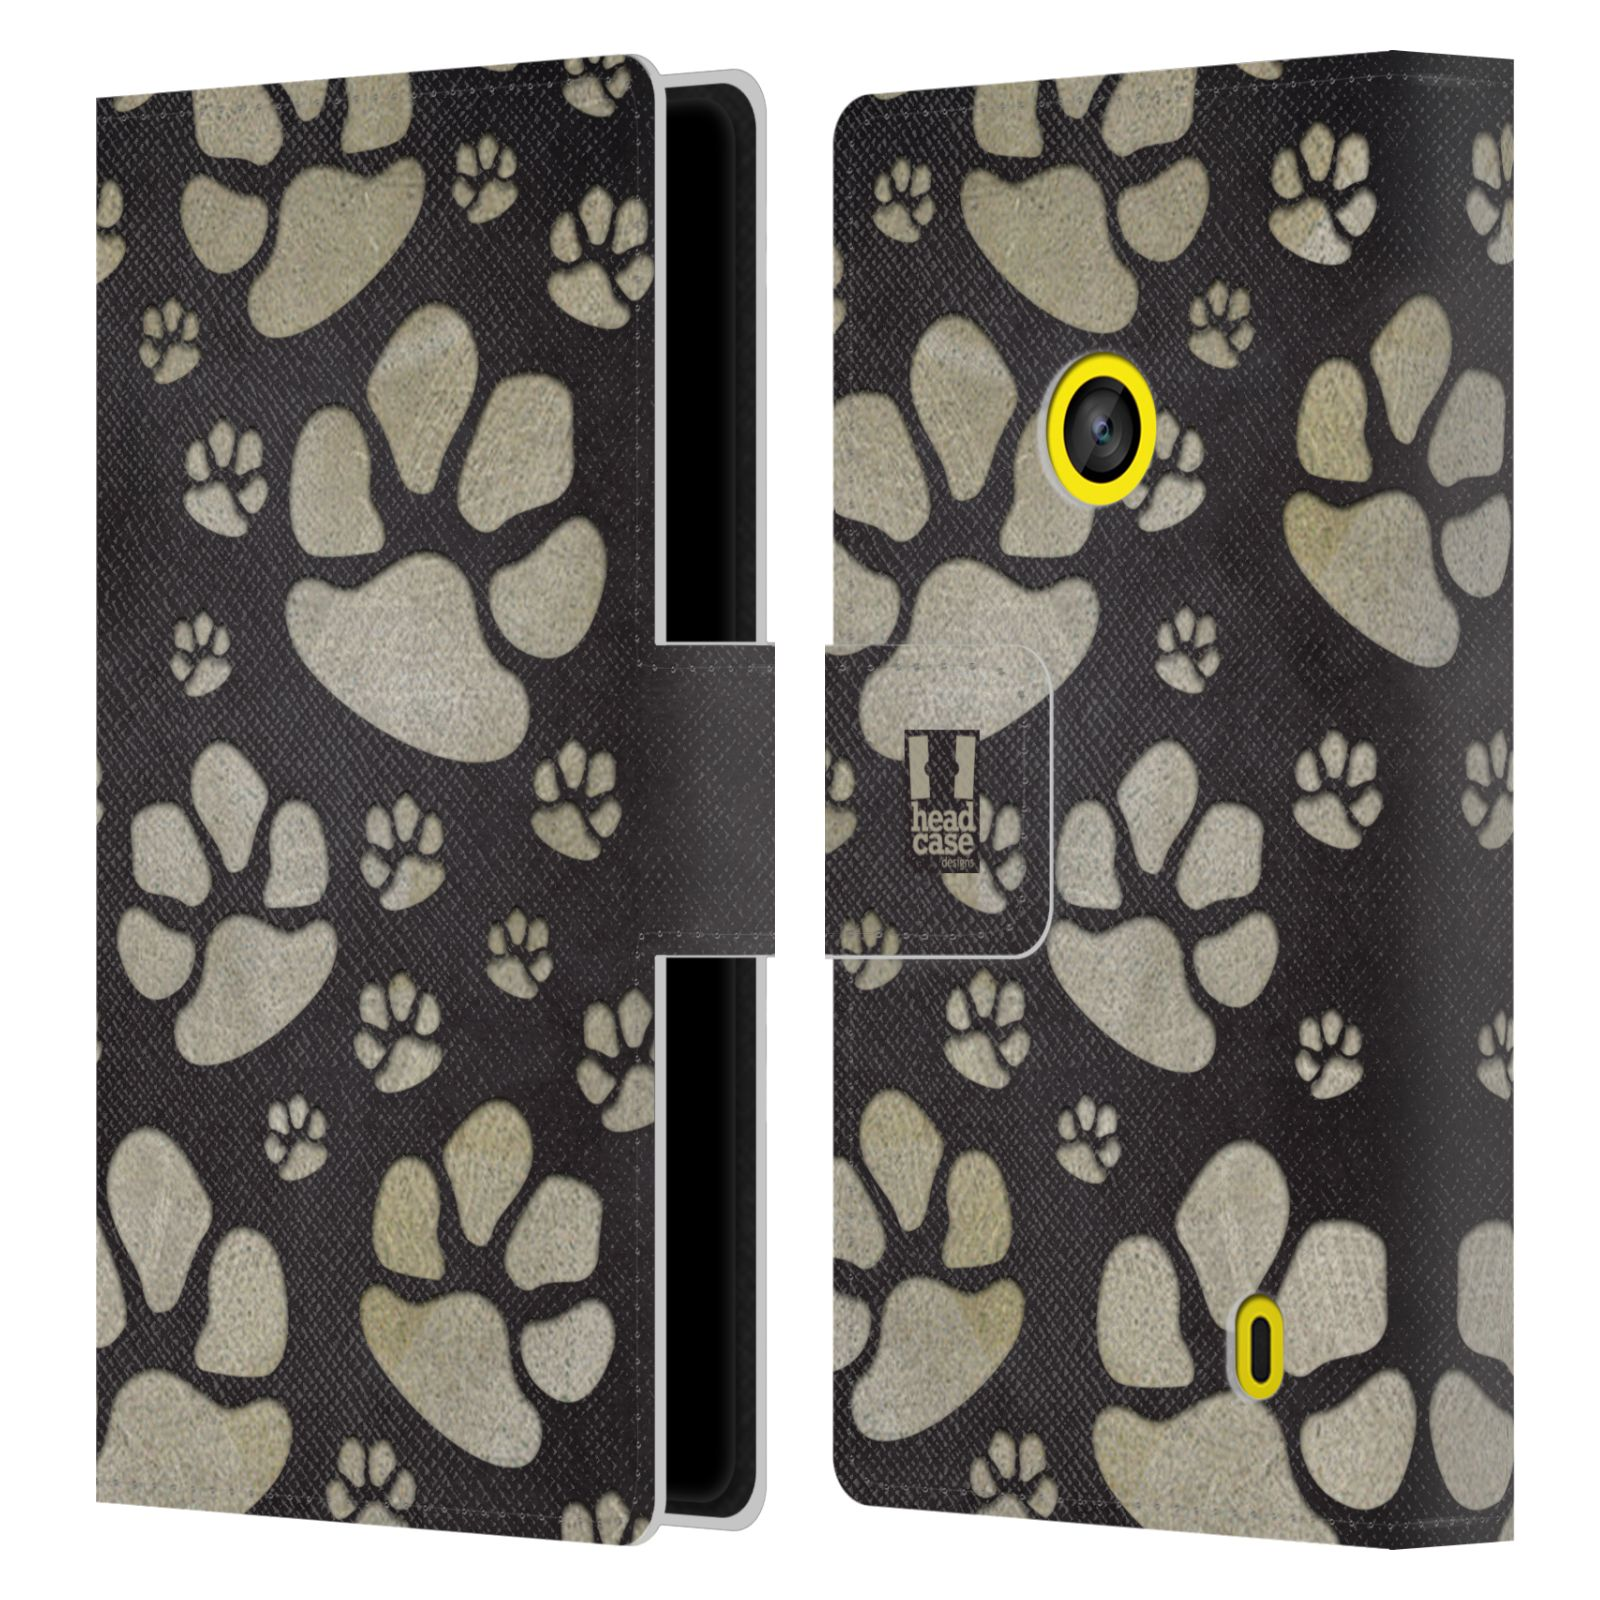 HEAD CASE Flipové pouzdro pro mobil NOKIA LUMIA 520 / 525 Pejsek ťapky velké tmavá